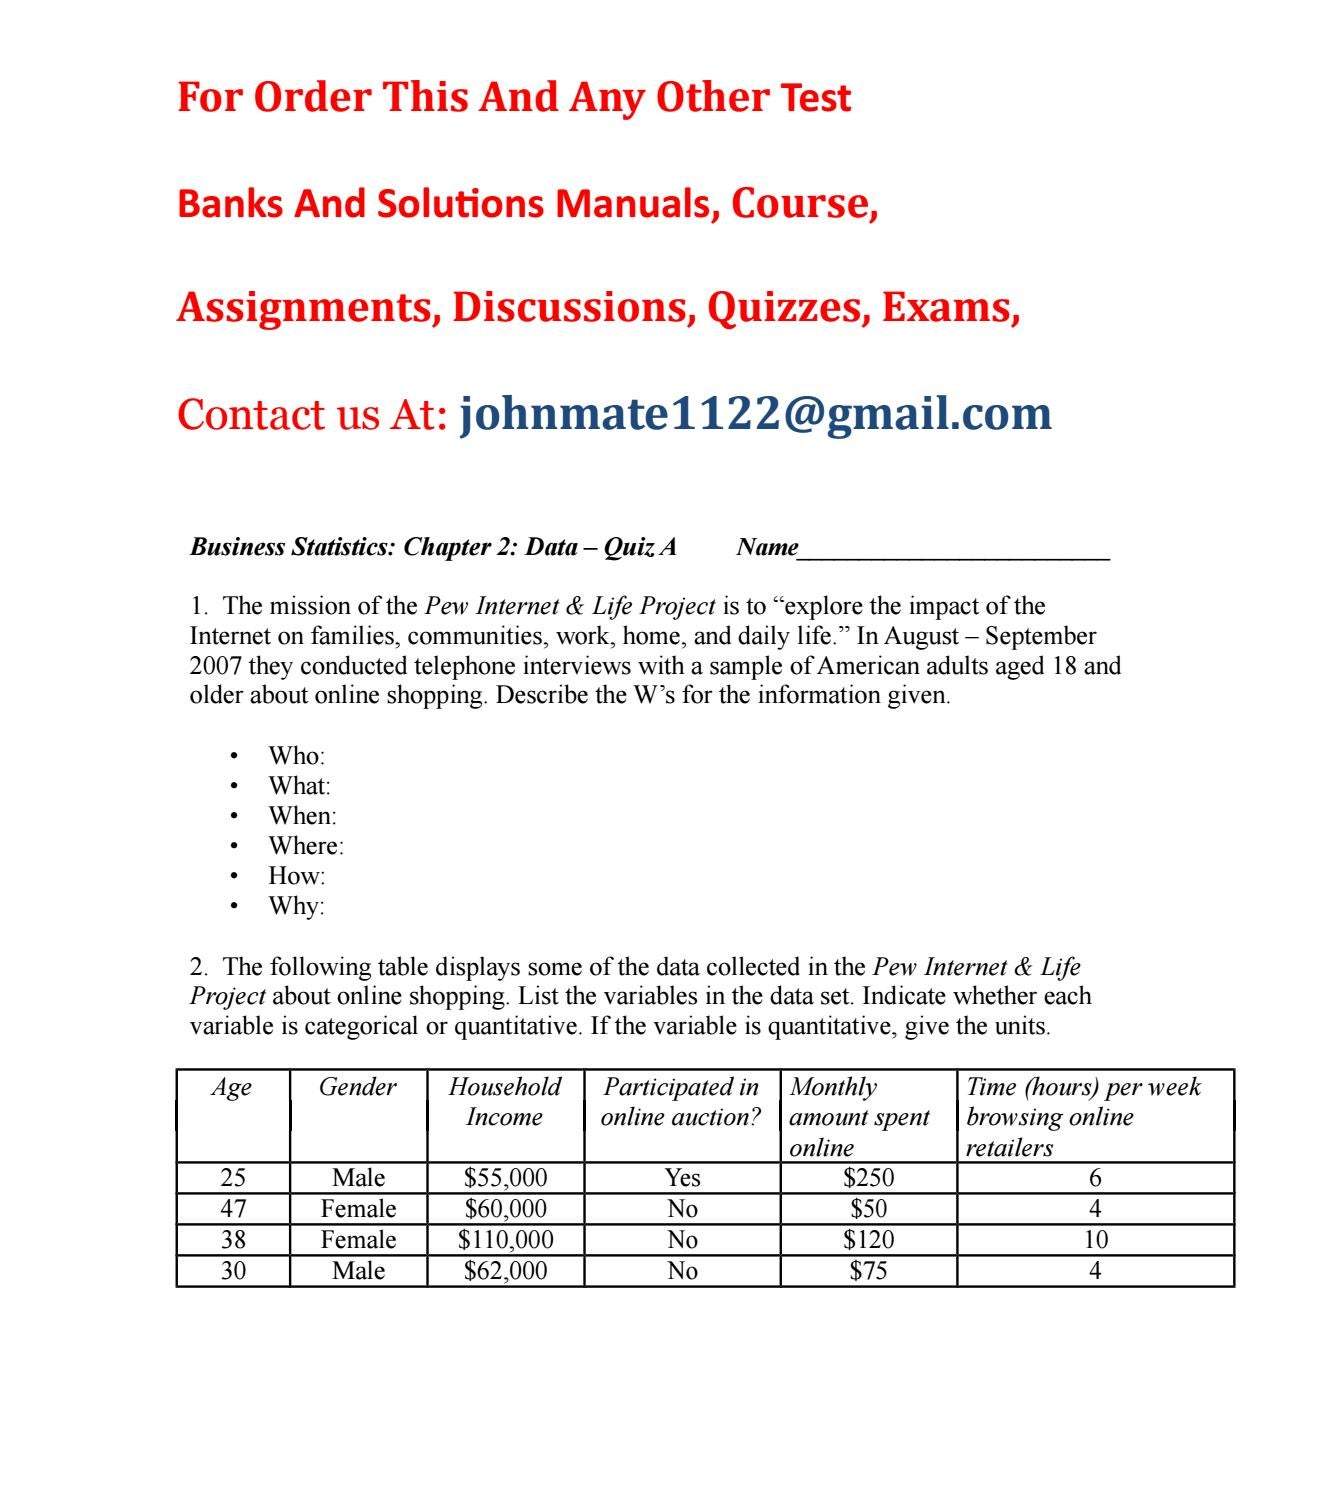 Test bank business statistics 2nd edition by yandex325 - issuu